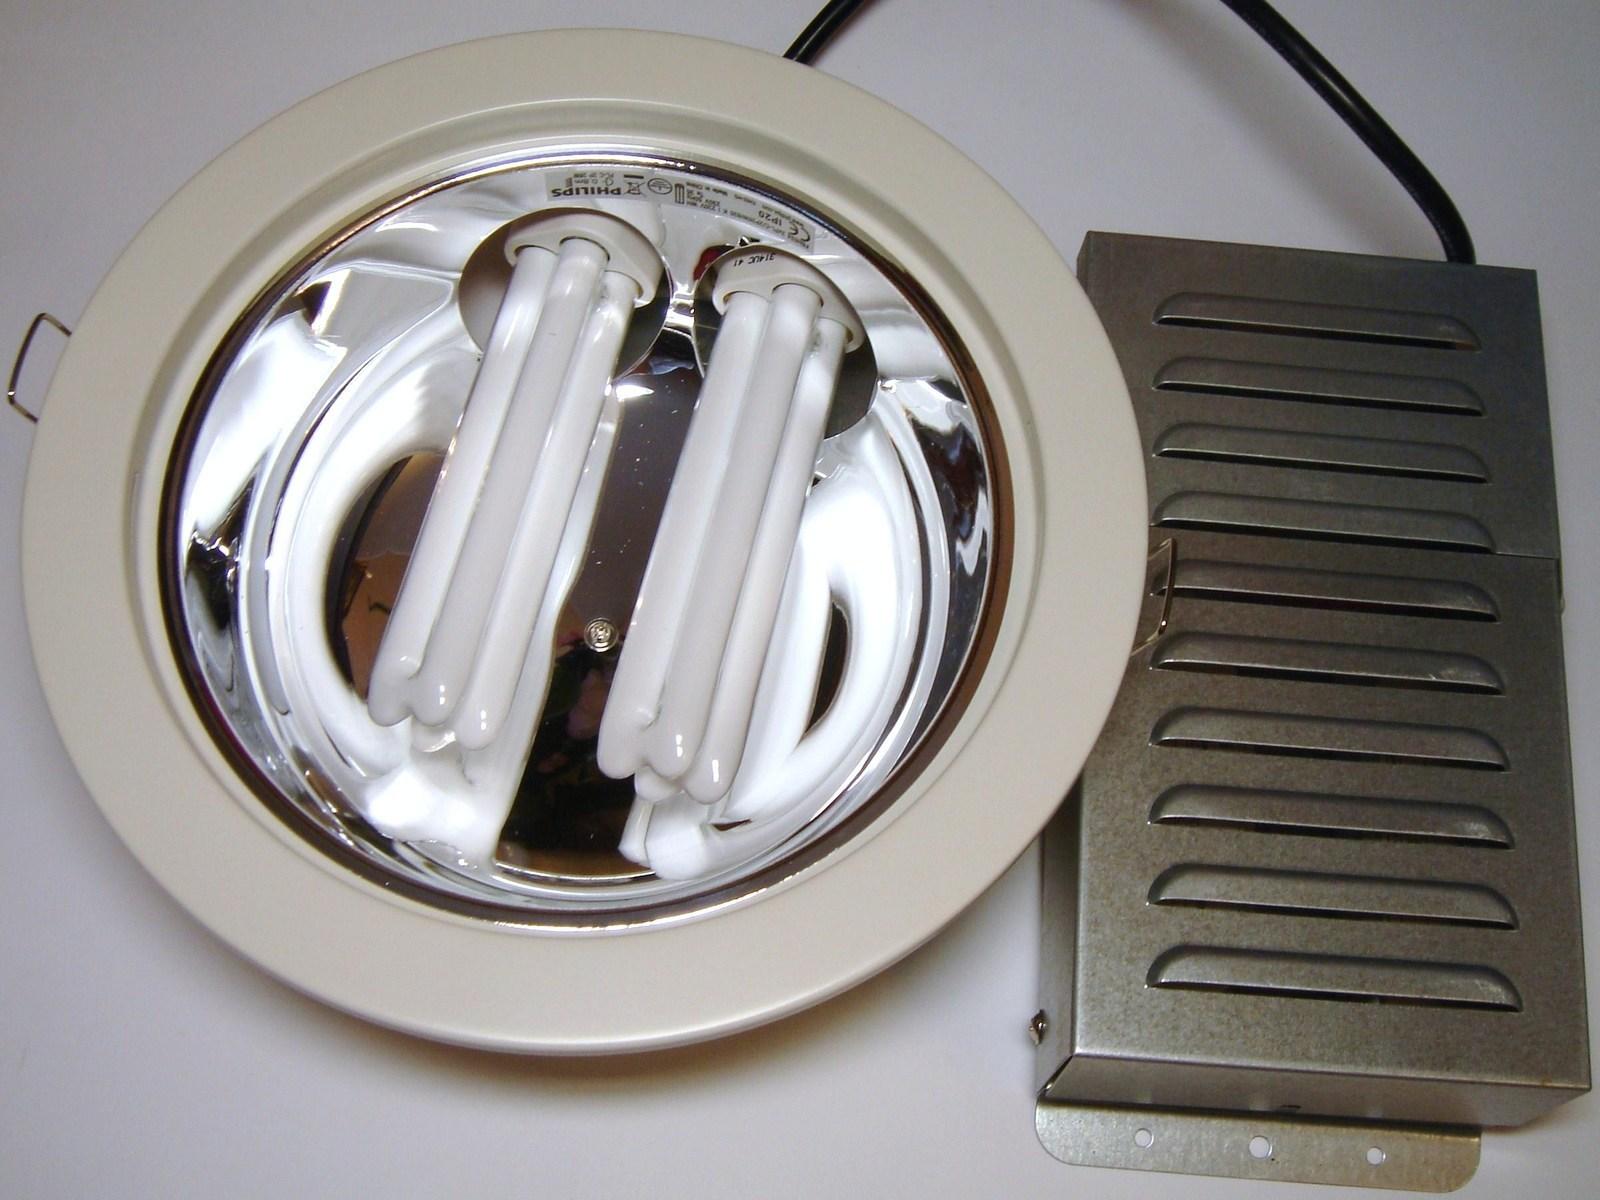 Ripplaevalgusti 2 x 26 W, Philips, FBH024 2xPL-C/2P26W/830 K I 230V WH, 88514599